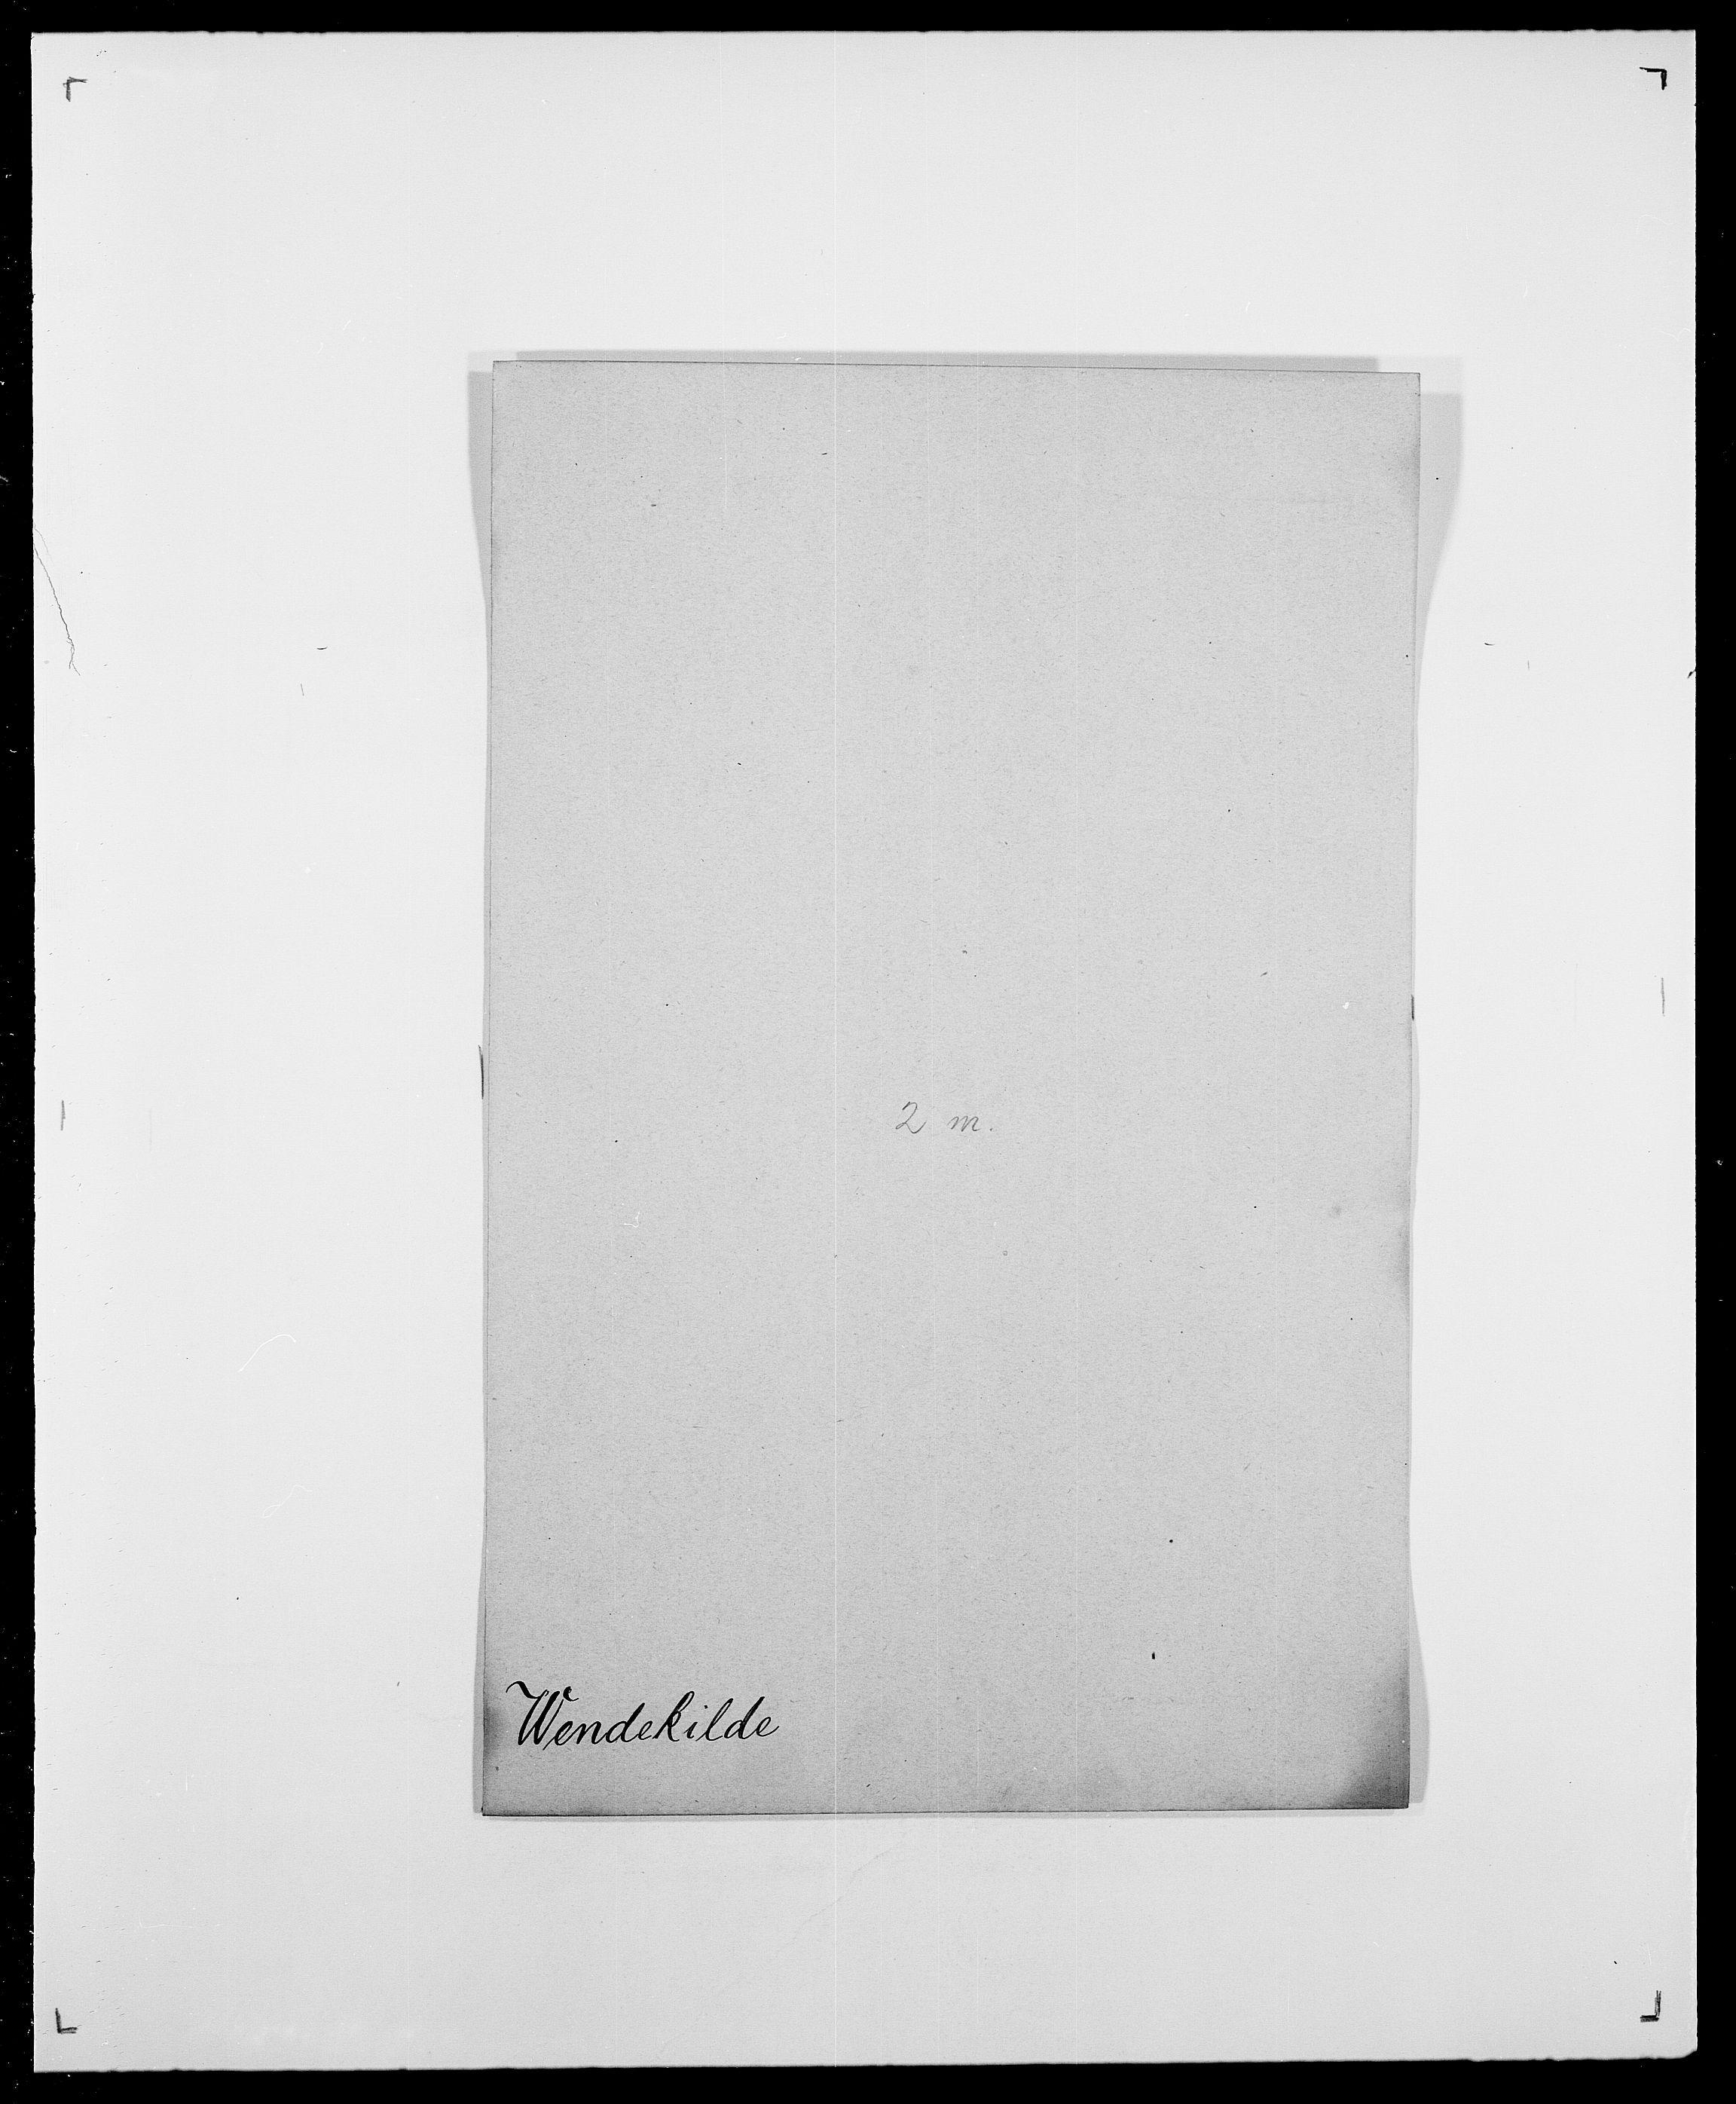 SAO, Delgobe, Charles Antoine - samling, D/Da/L0041: Vemmestad - Viker, s. 8